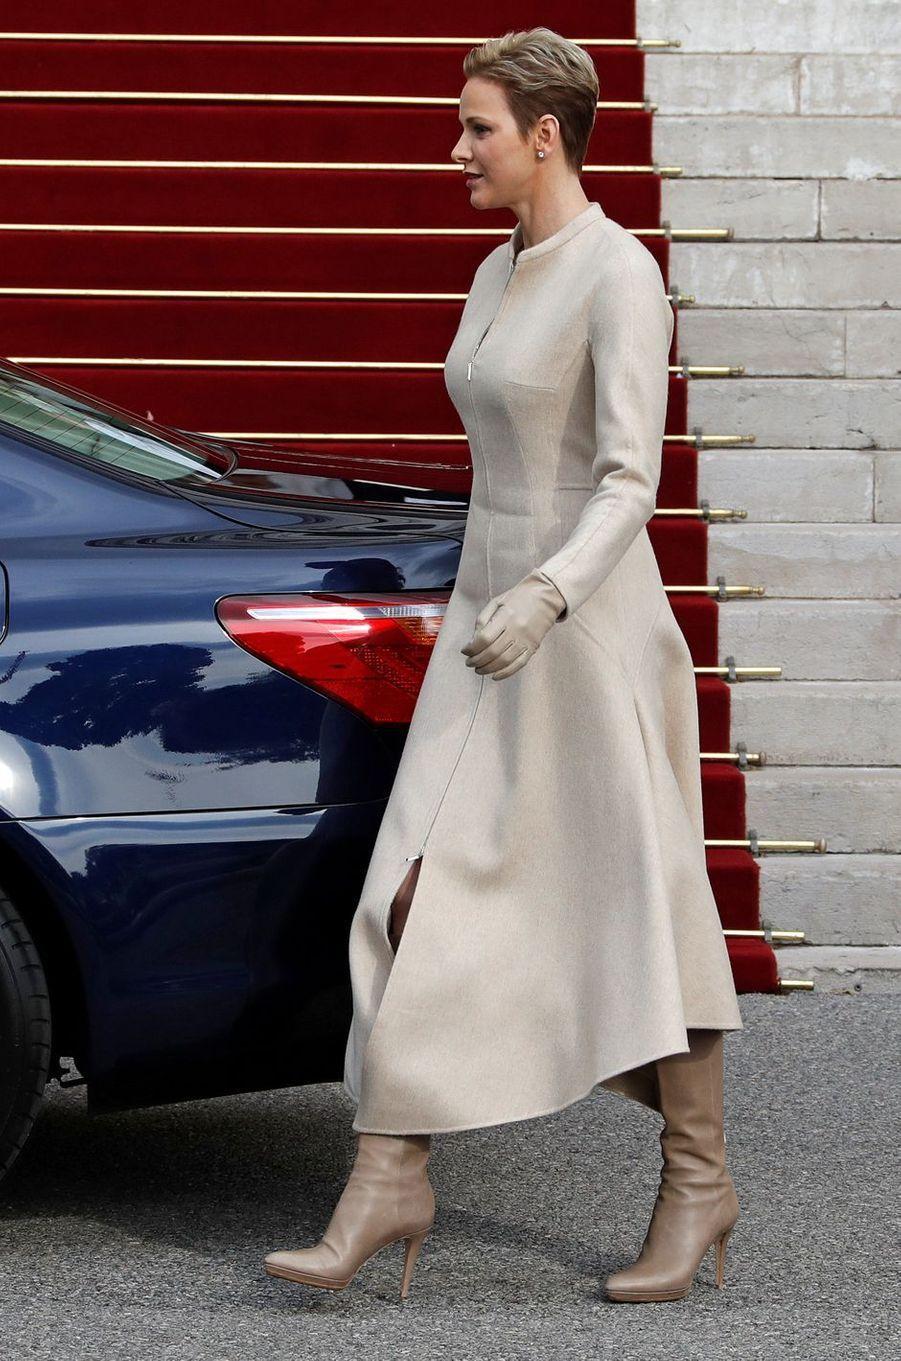 La princesse Charlène de Monaco à Monaco, le 27 janvier 2017